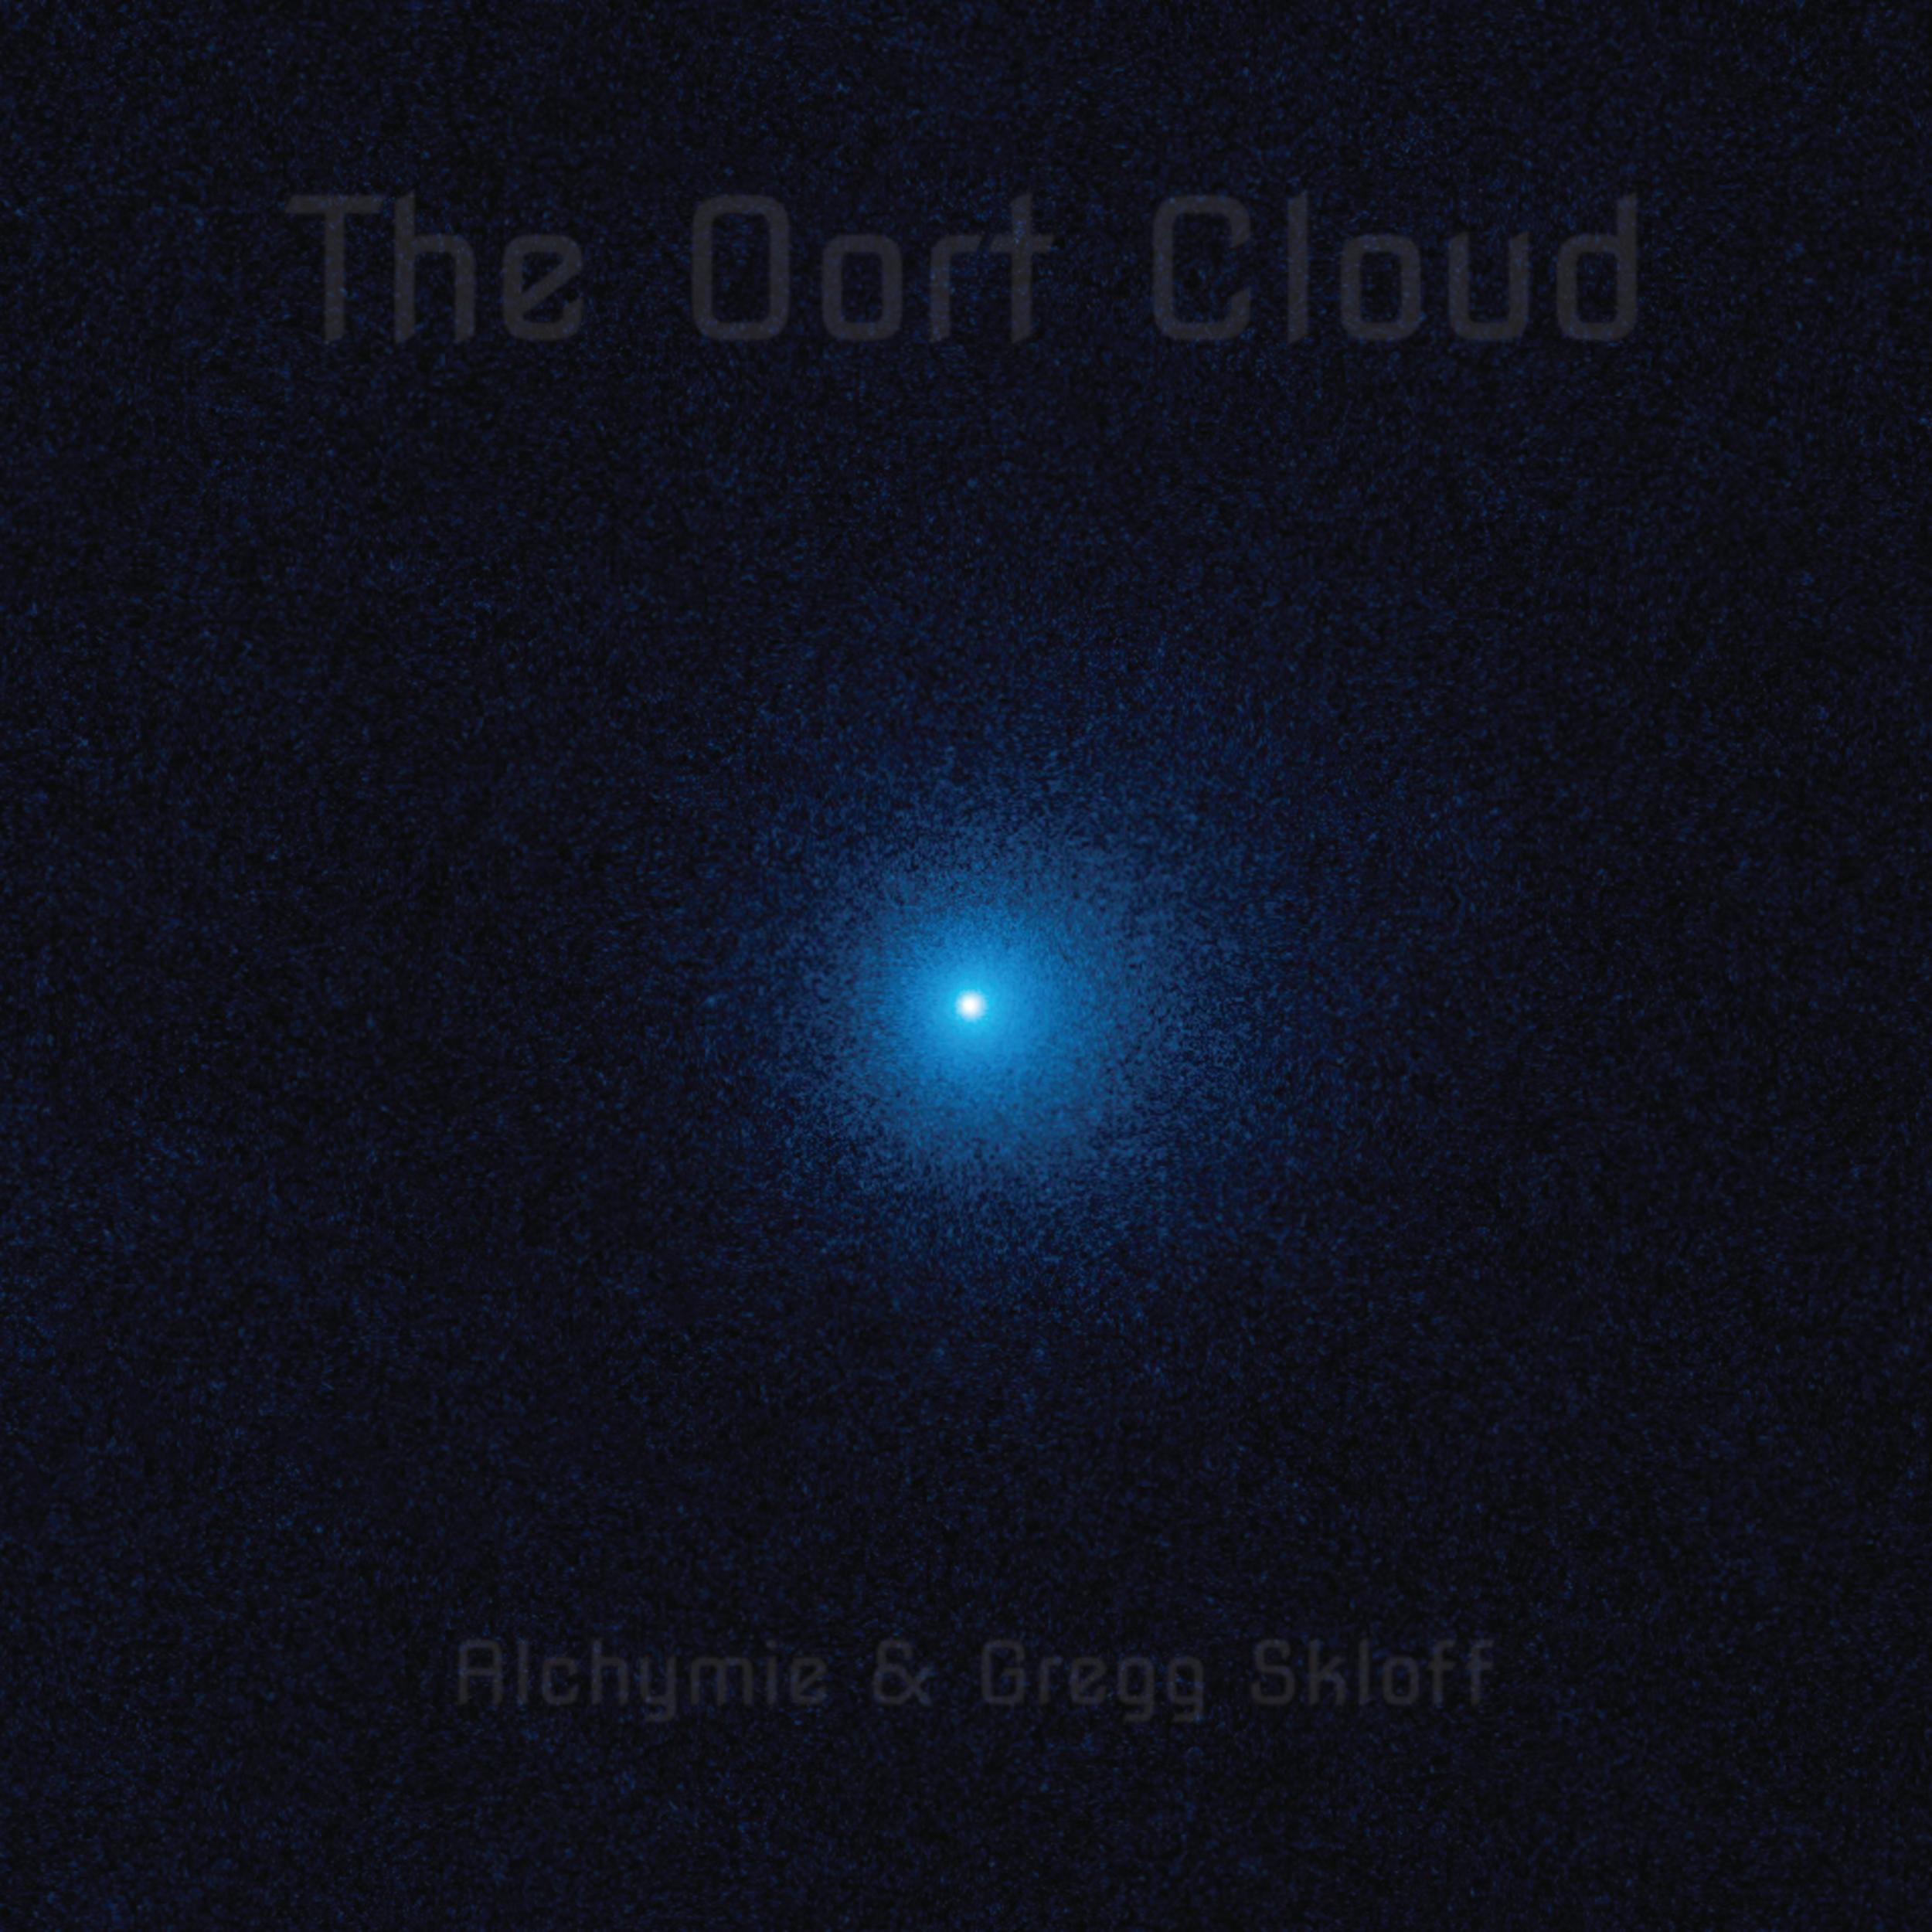 The Oort Cloud by Alchymie & Gregg Skloff